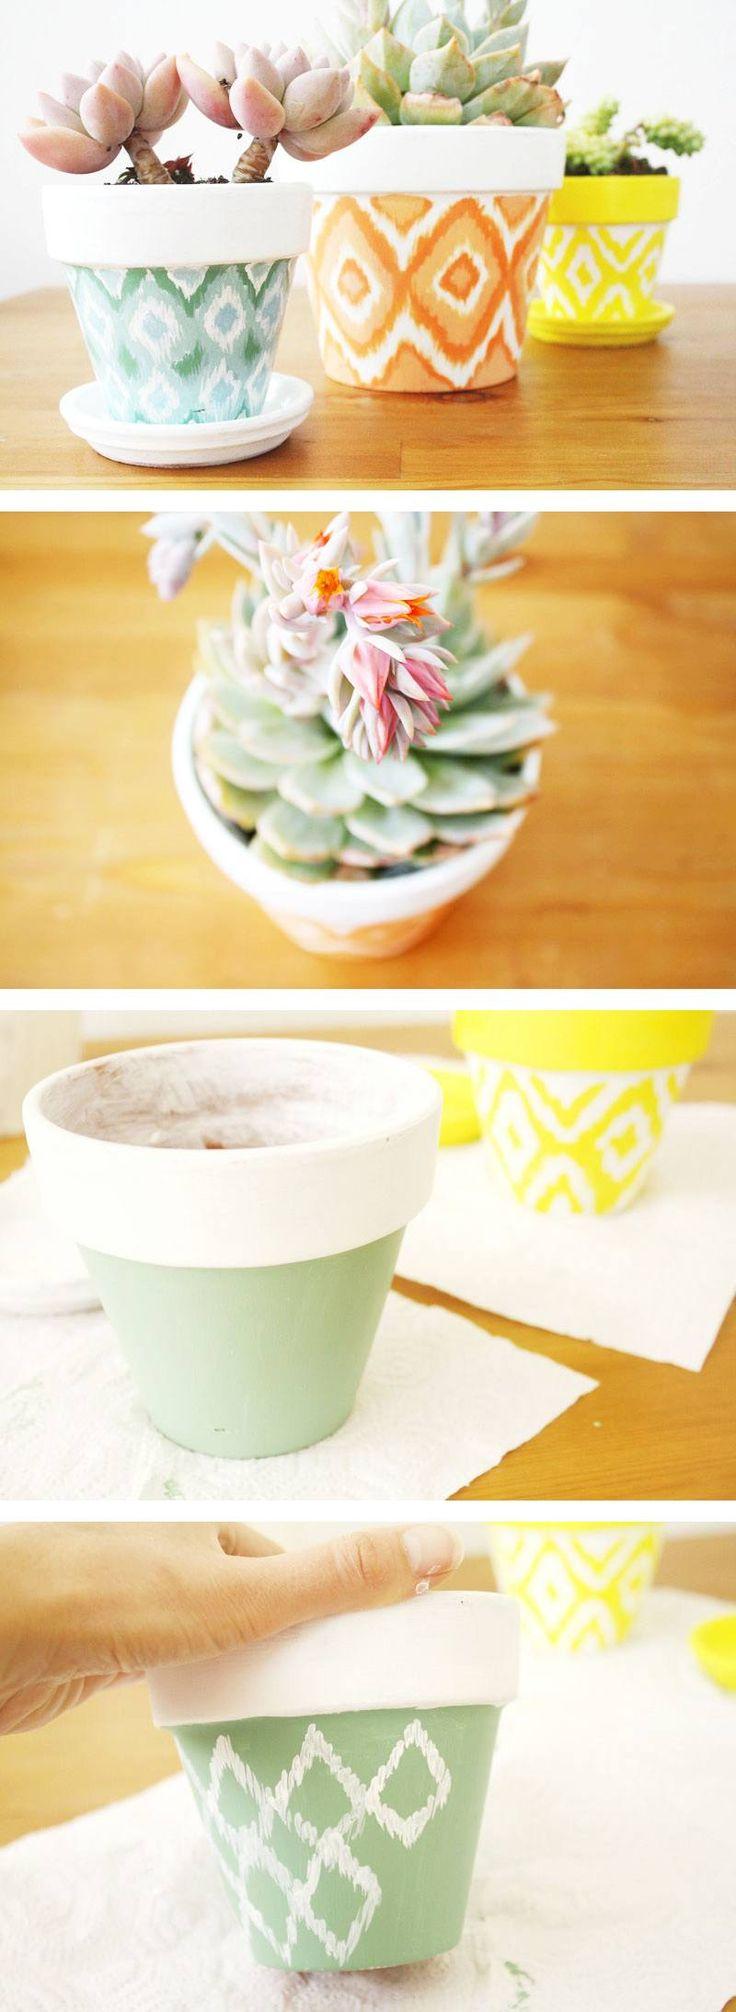 DIY Hand Painted Ikat Pots1